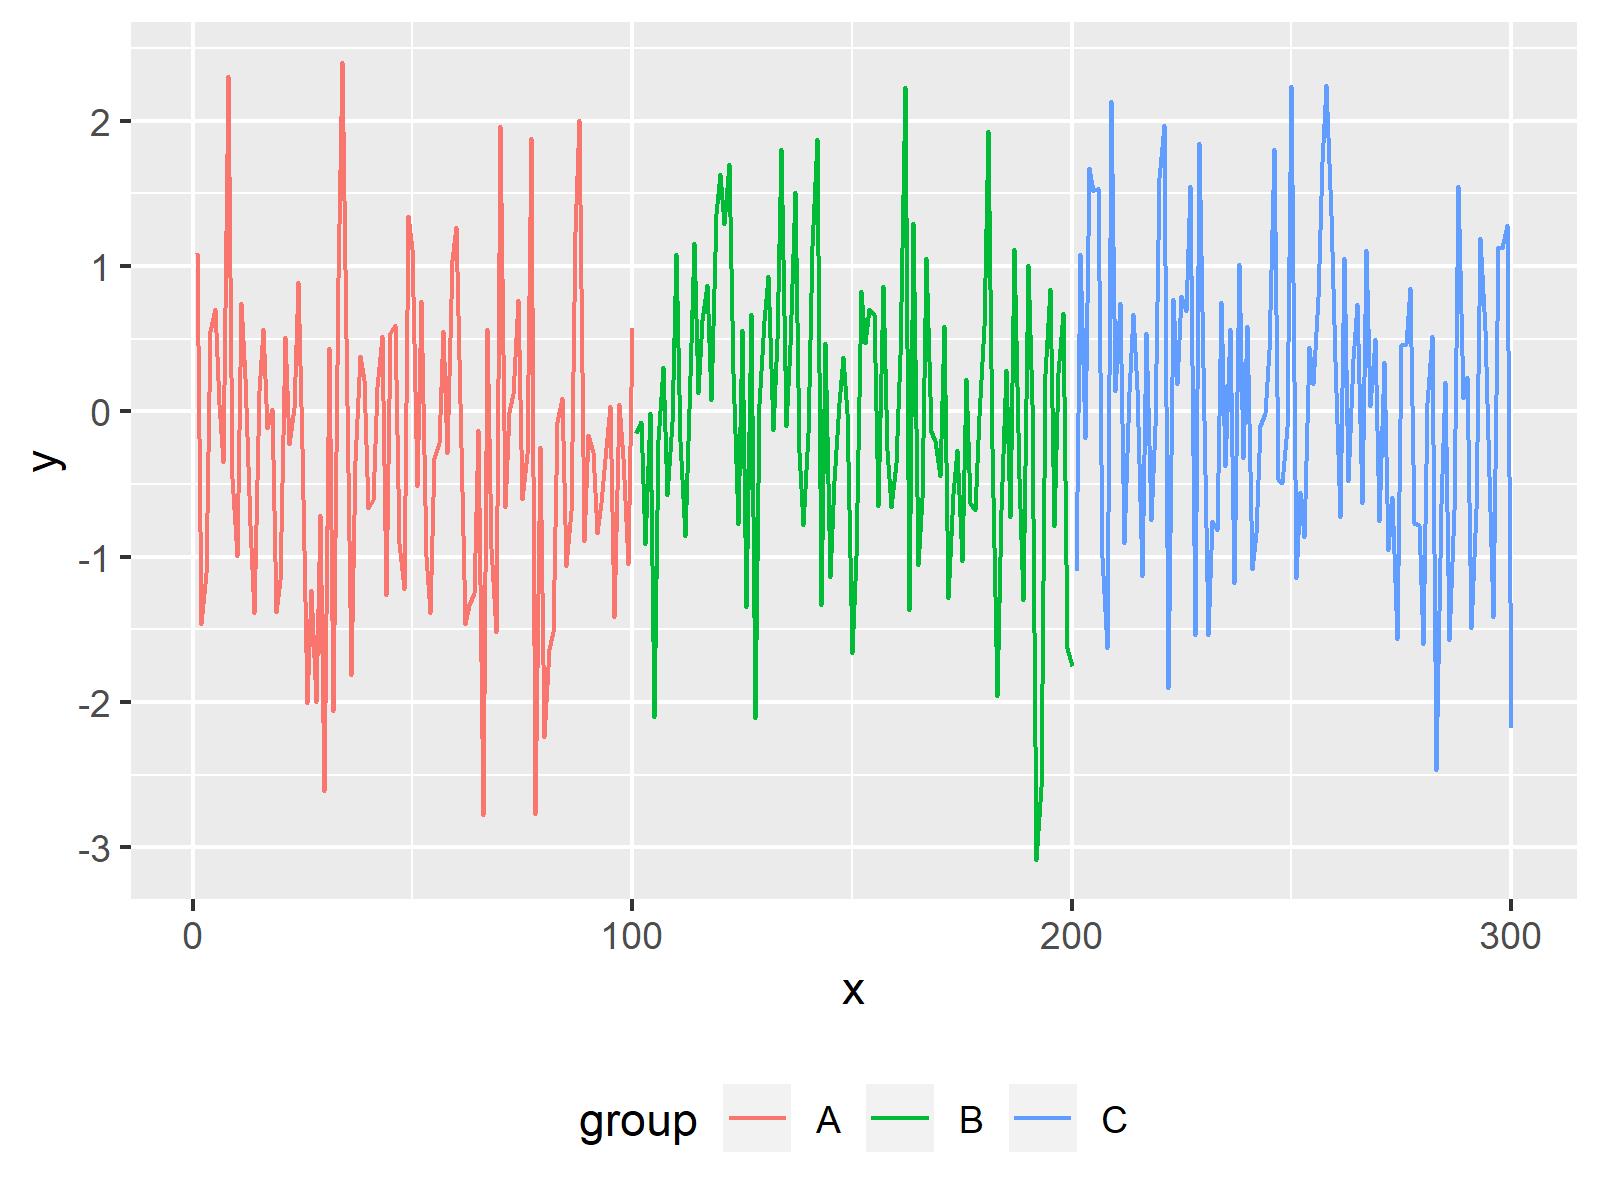 ggplot2 line chart default